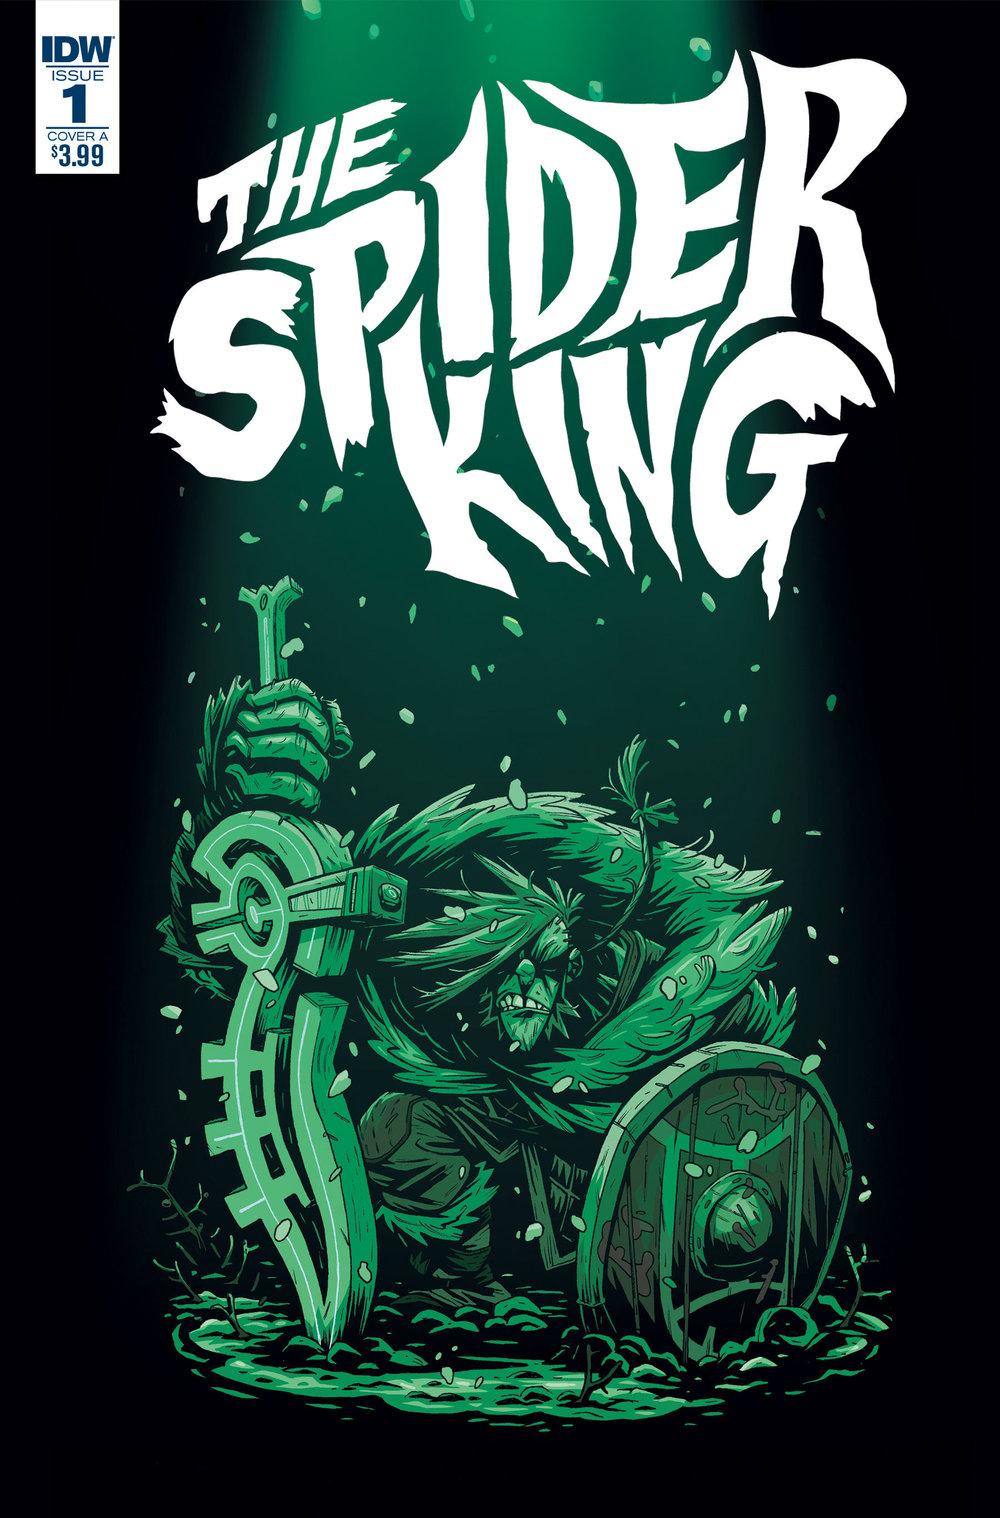 The Spider King.jpg